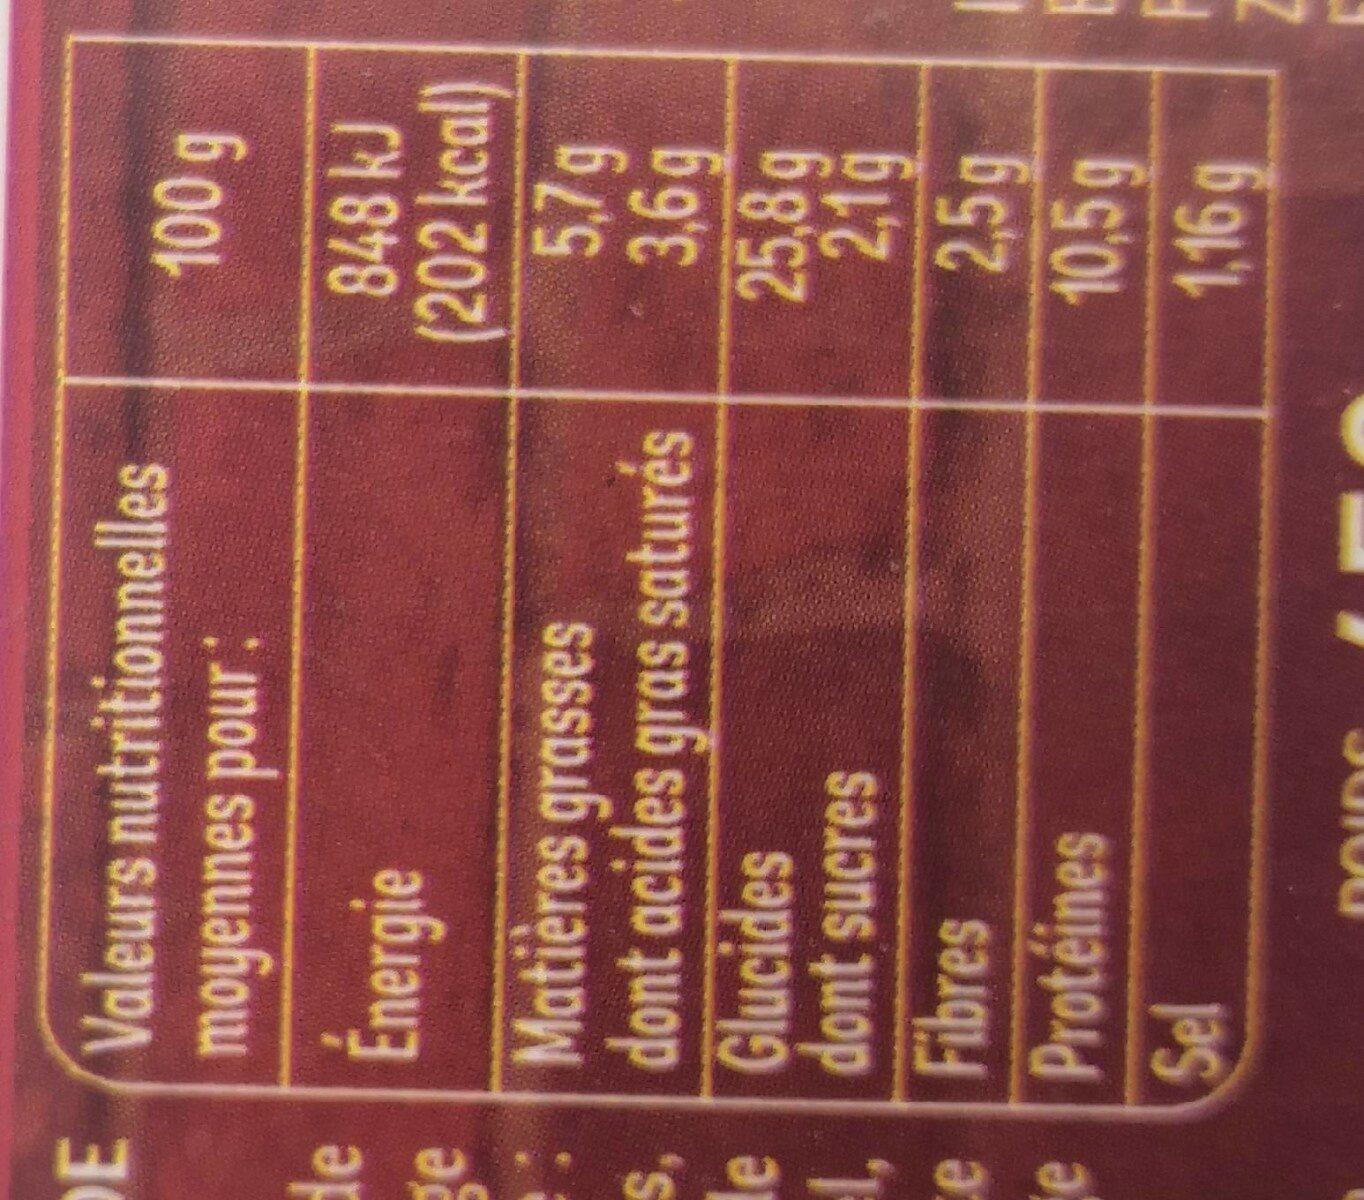 Pizza jambon emmental - Informations nutritionnelles - fr